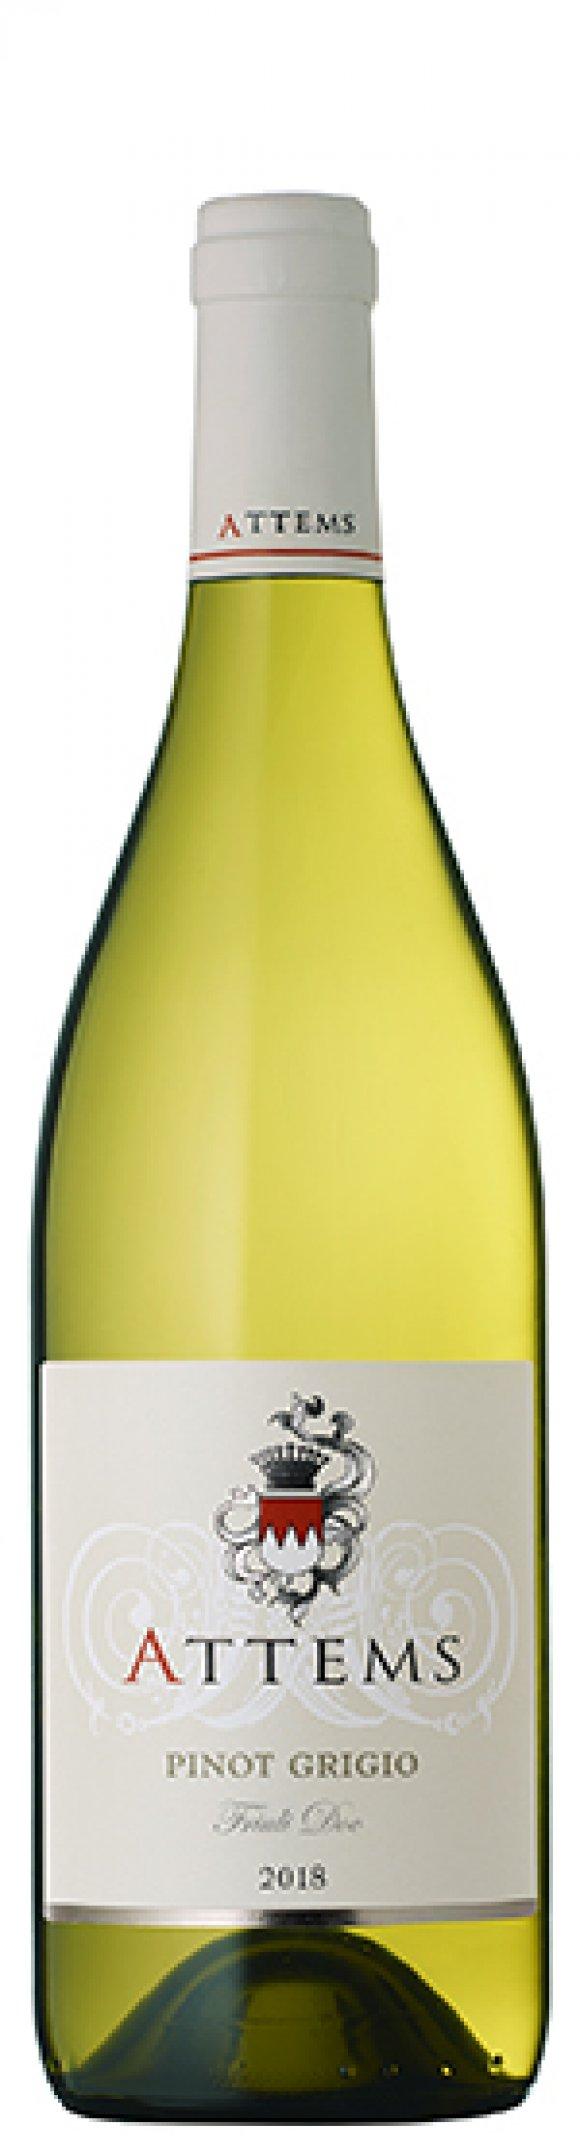 Wine Tasting Attems ( Friuli Venezia Giulia )